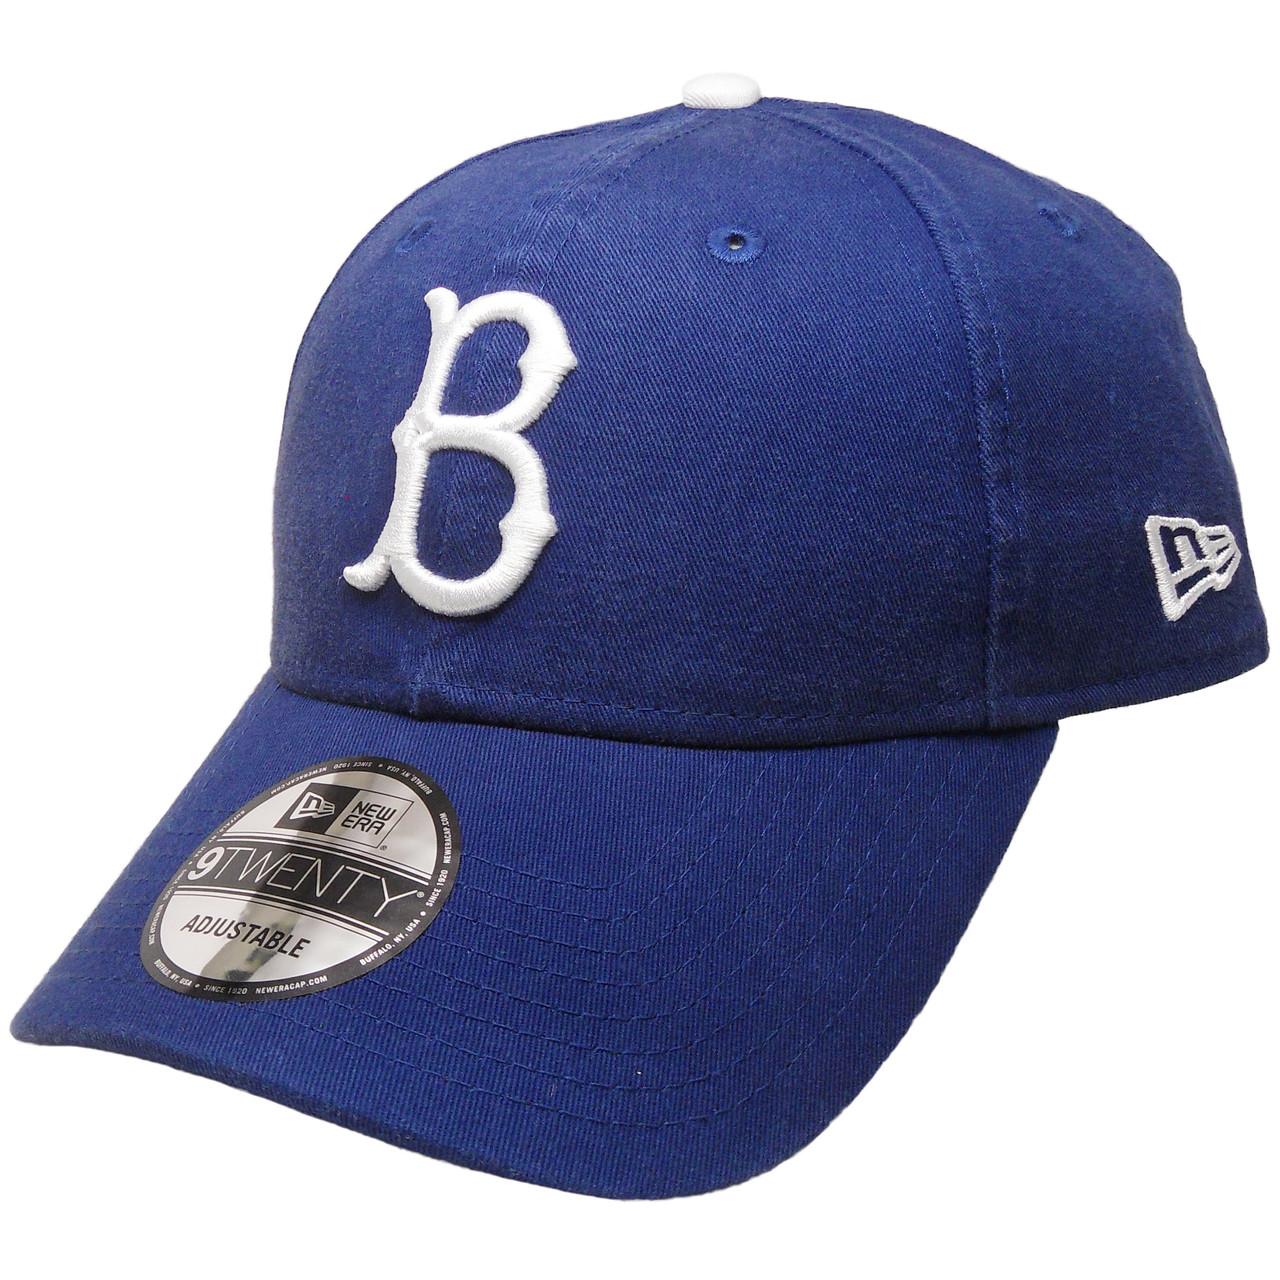 USC Trojans Khaki Adjustable Toddler Baseball Hat NWT